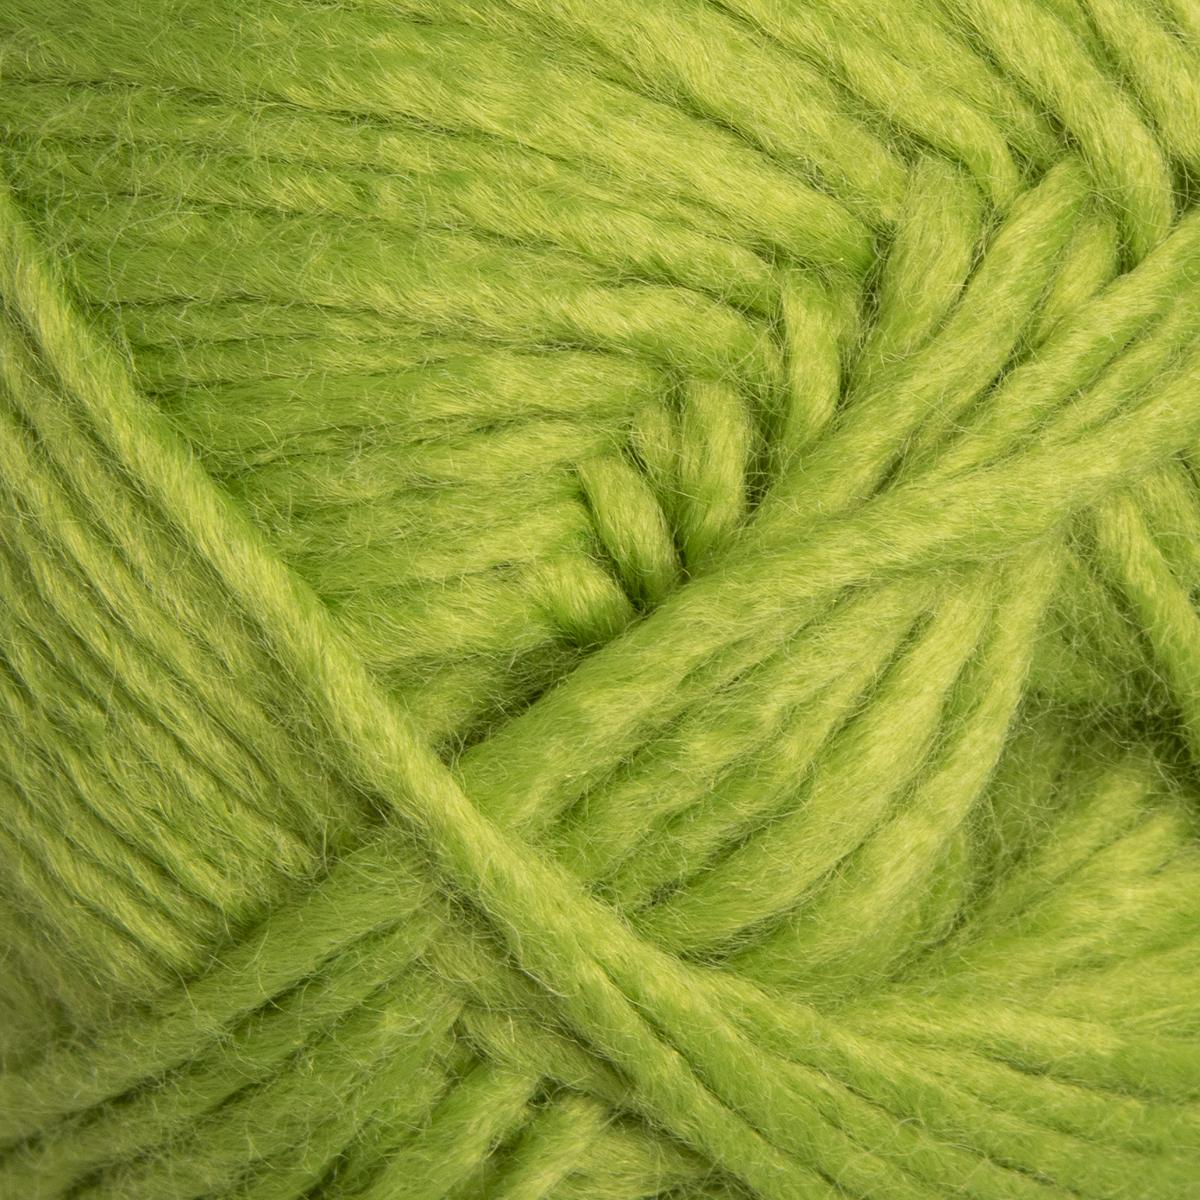 3pk-Lion-Brand-New-Basic-Acrylic-amp-Wool-Yarn-Medium-4-Knit-Crochet-Skeins-Soft thumbnail 47